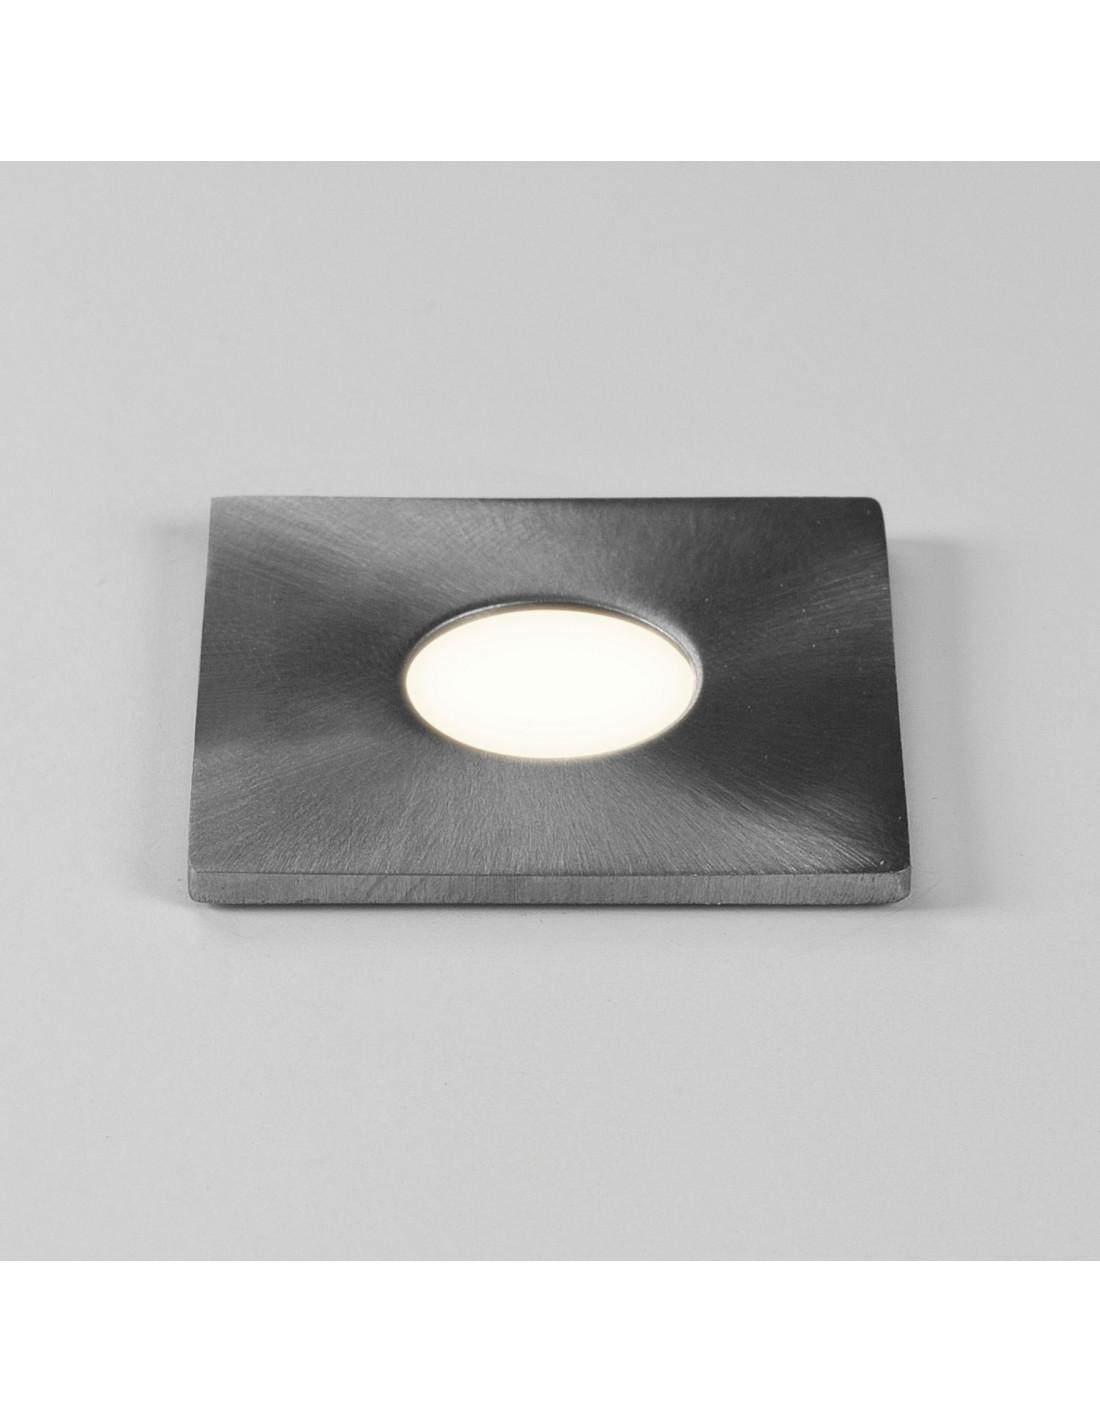 Spot encastré Terra 28 Led carré acier inoxydable brossé astro lighting